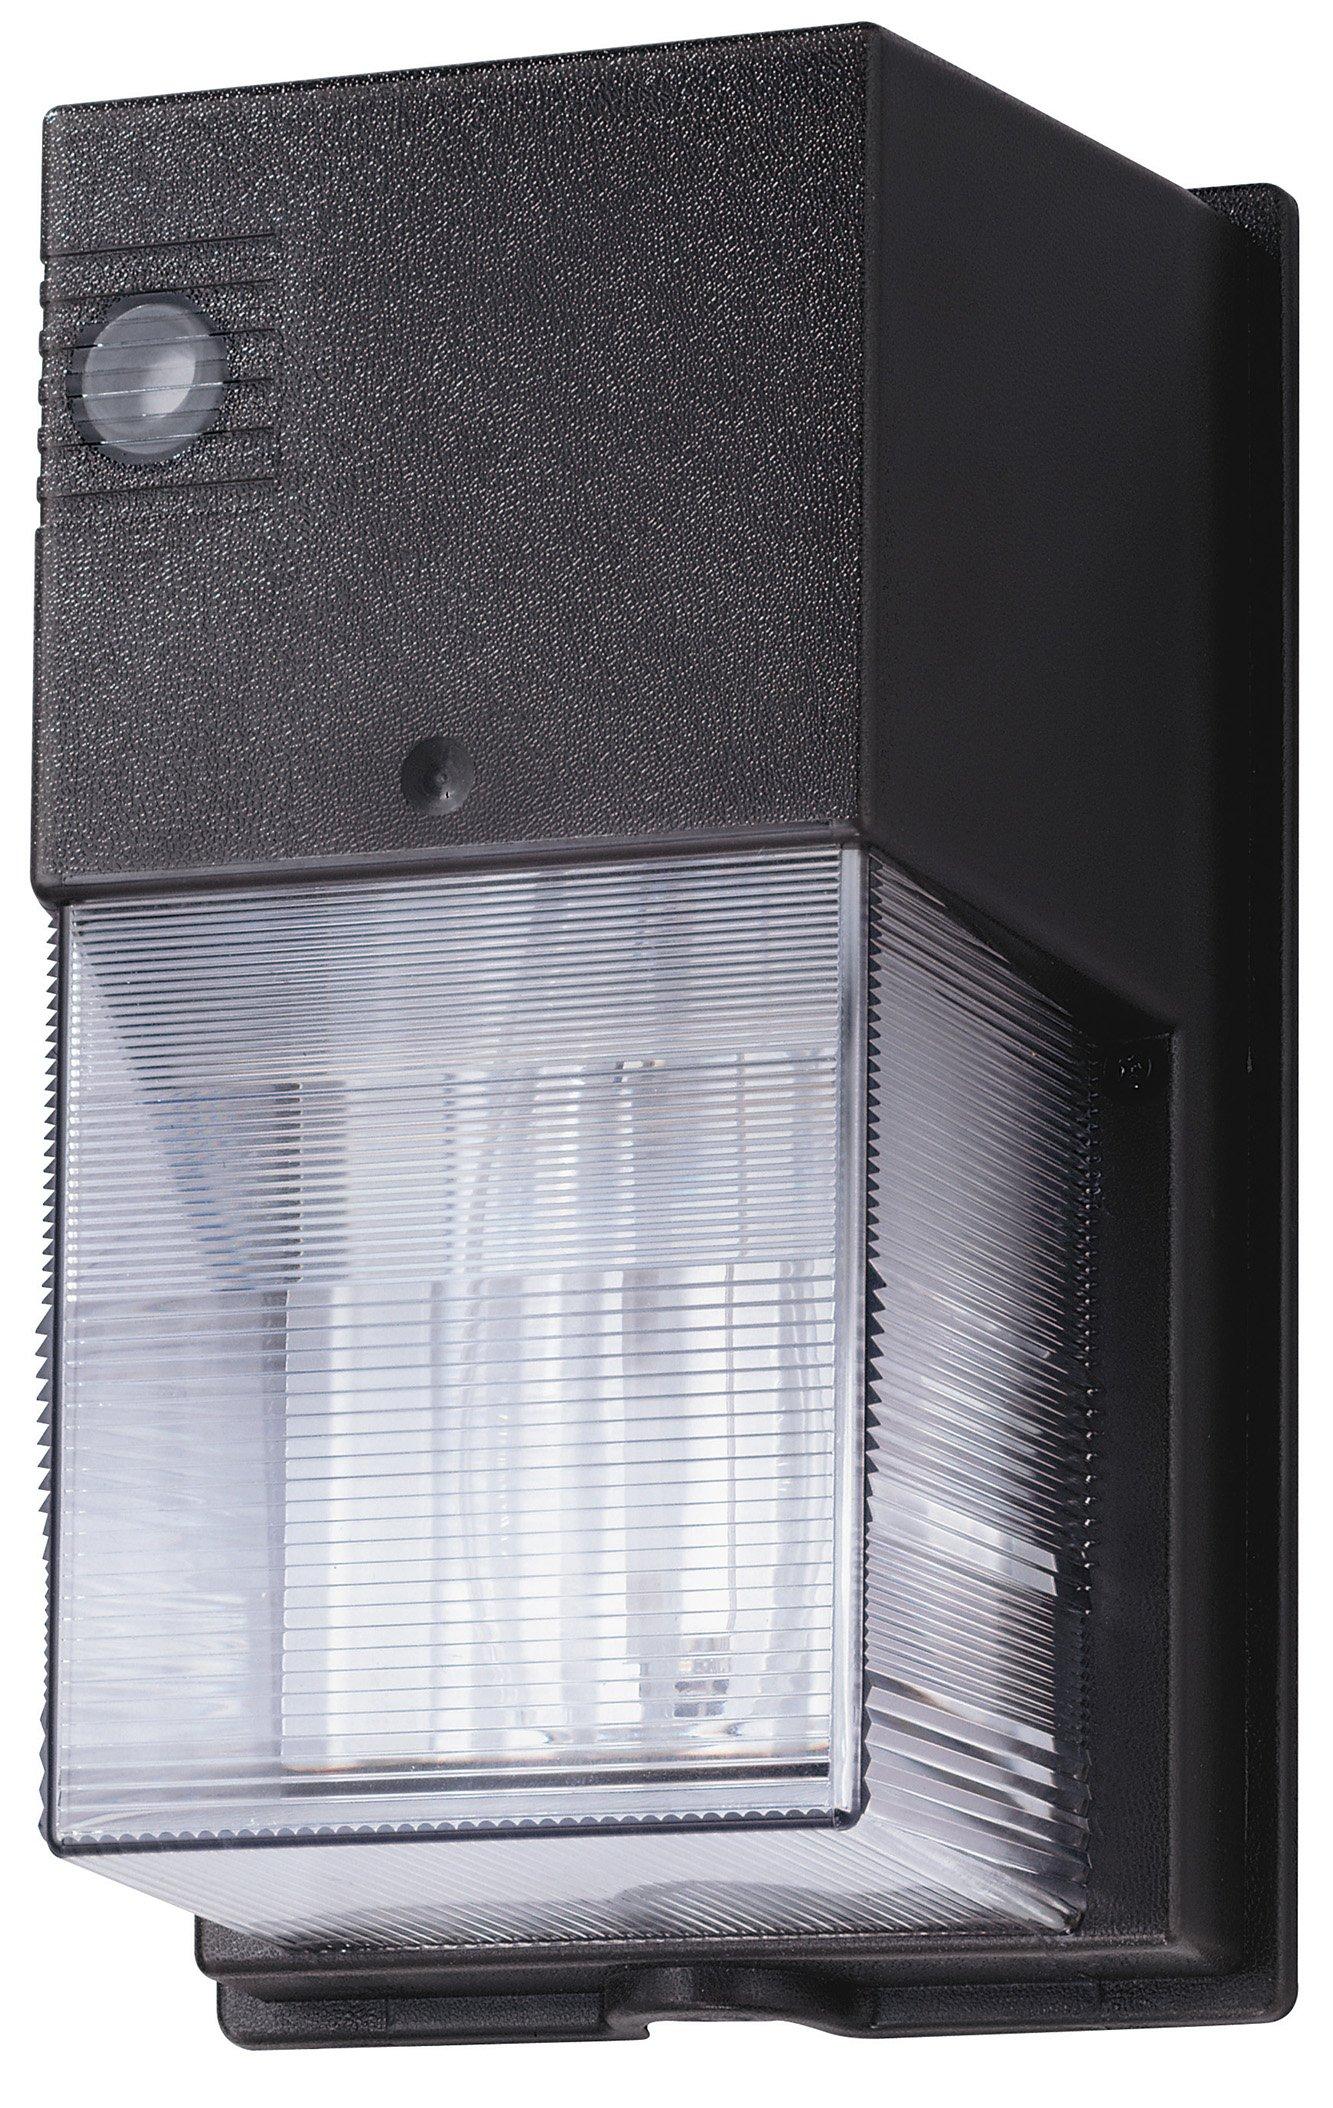 Lithonia Lighting TWS 50M 120 PE LPI M6 50-watt Metal Halide Wallpack with Photocell and Lamp, Bronze by Lithonia Lighting